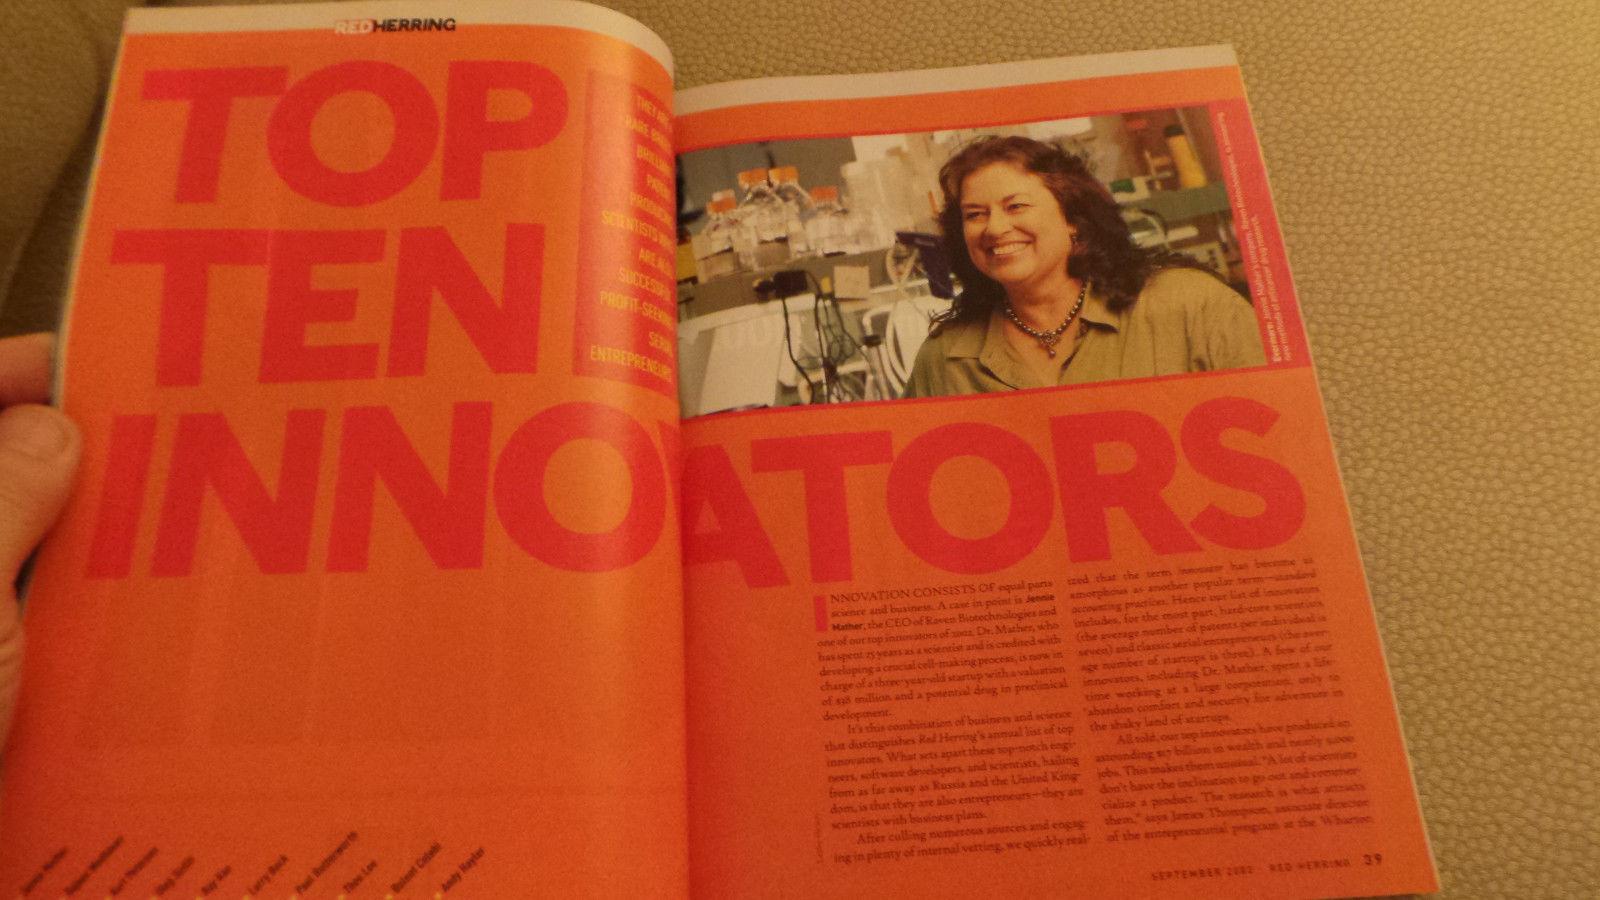 Red Herring Magazine Top 10 Innovators; Digital Entertainment; Mark Warner 2002